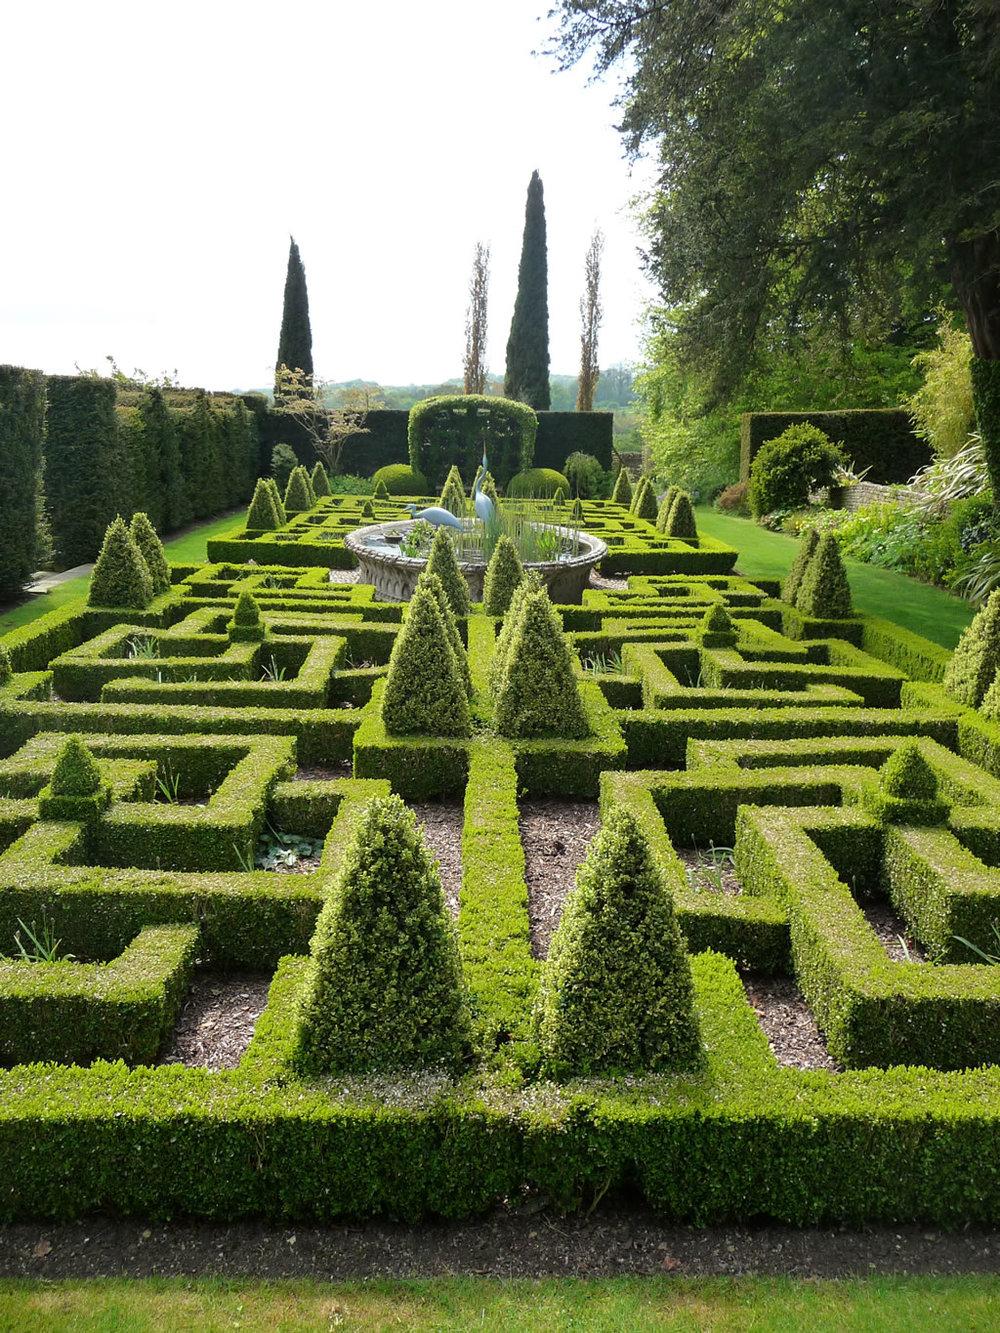 bourton-house-garden-knot-garden.jpg